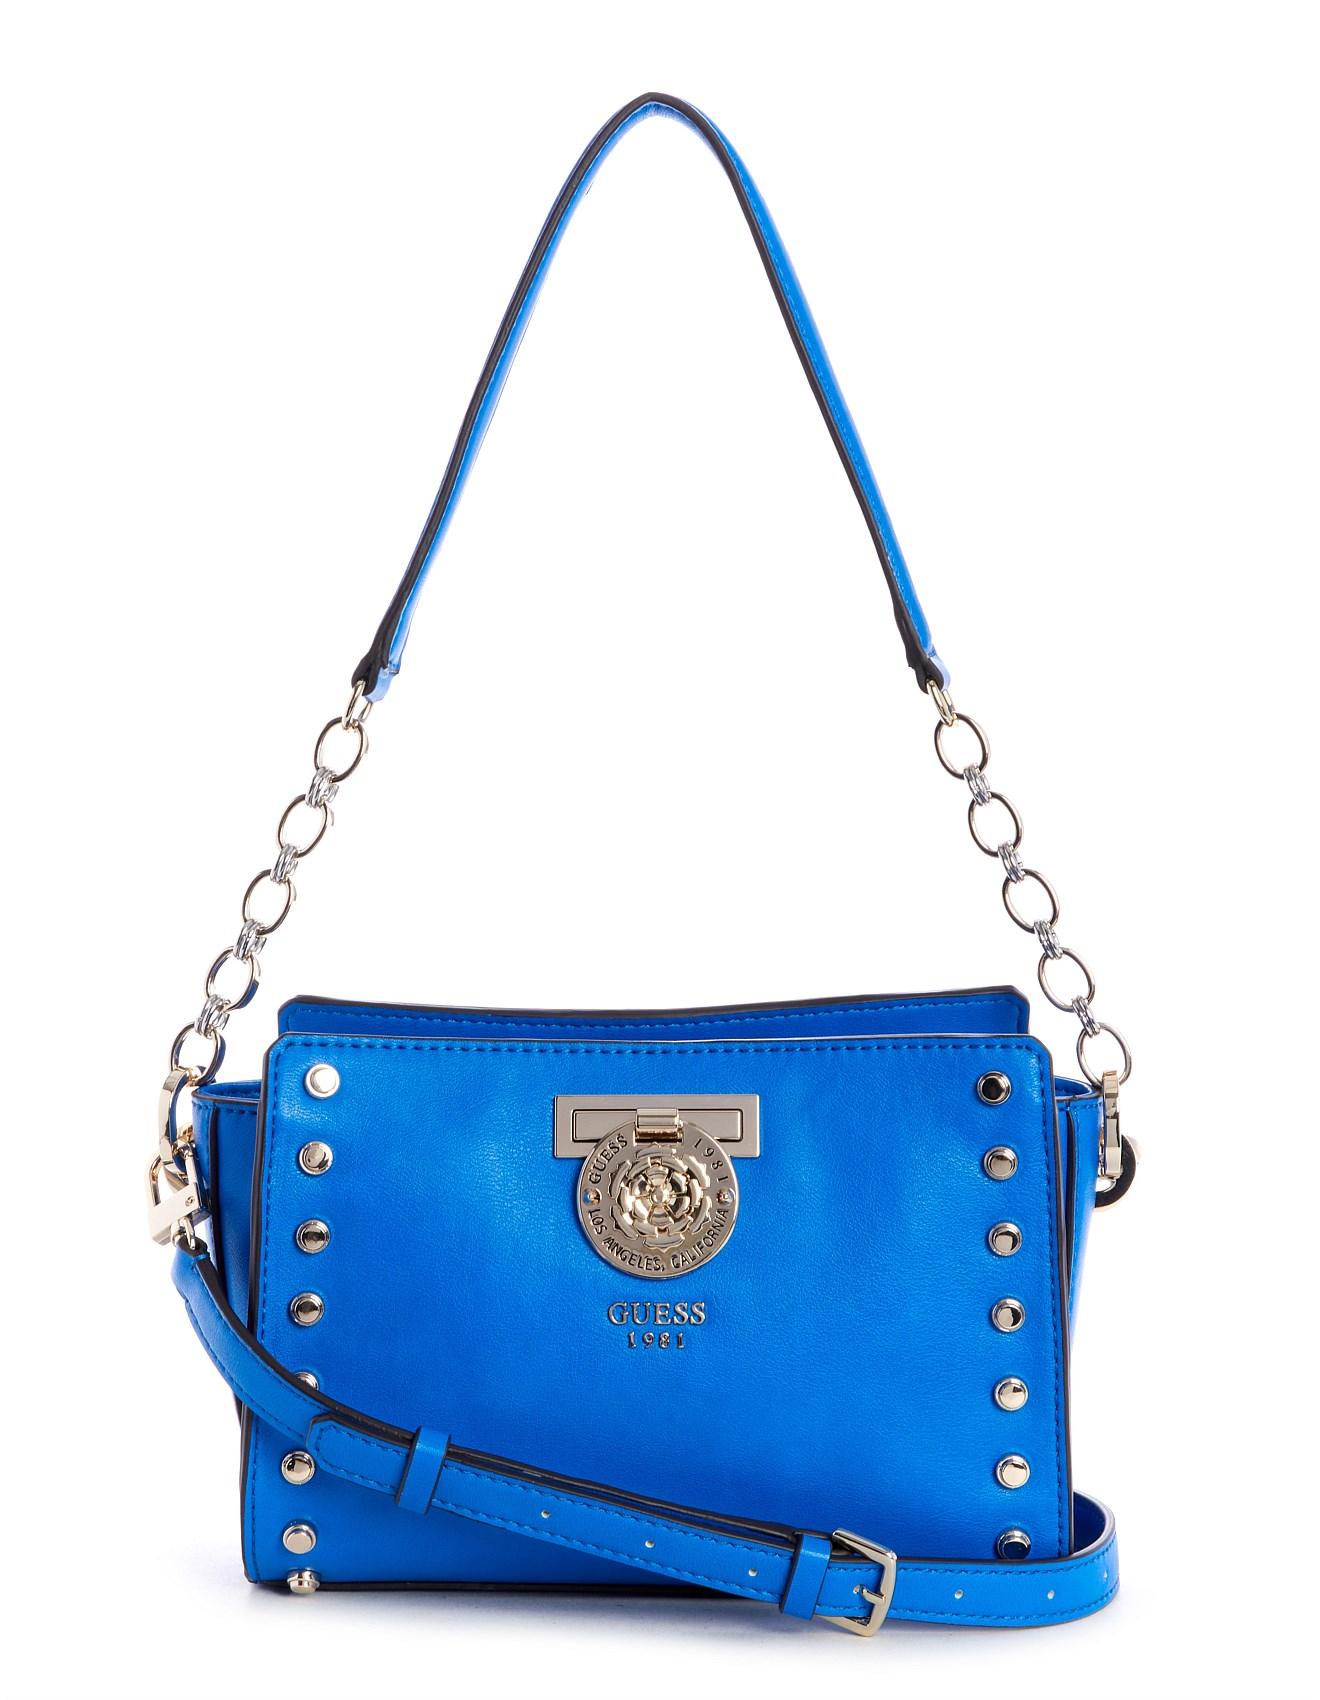 cheap guess purses, The Most Fashionable Guess Handbags